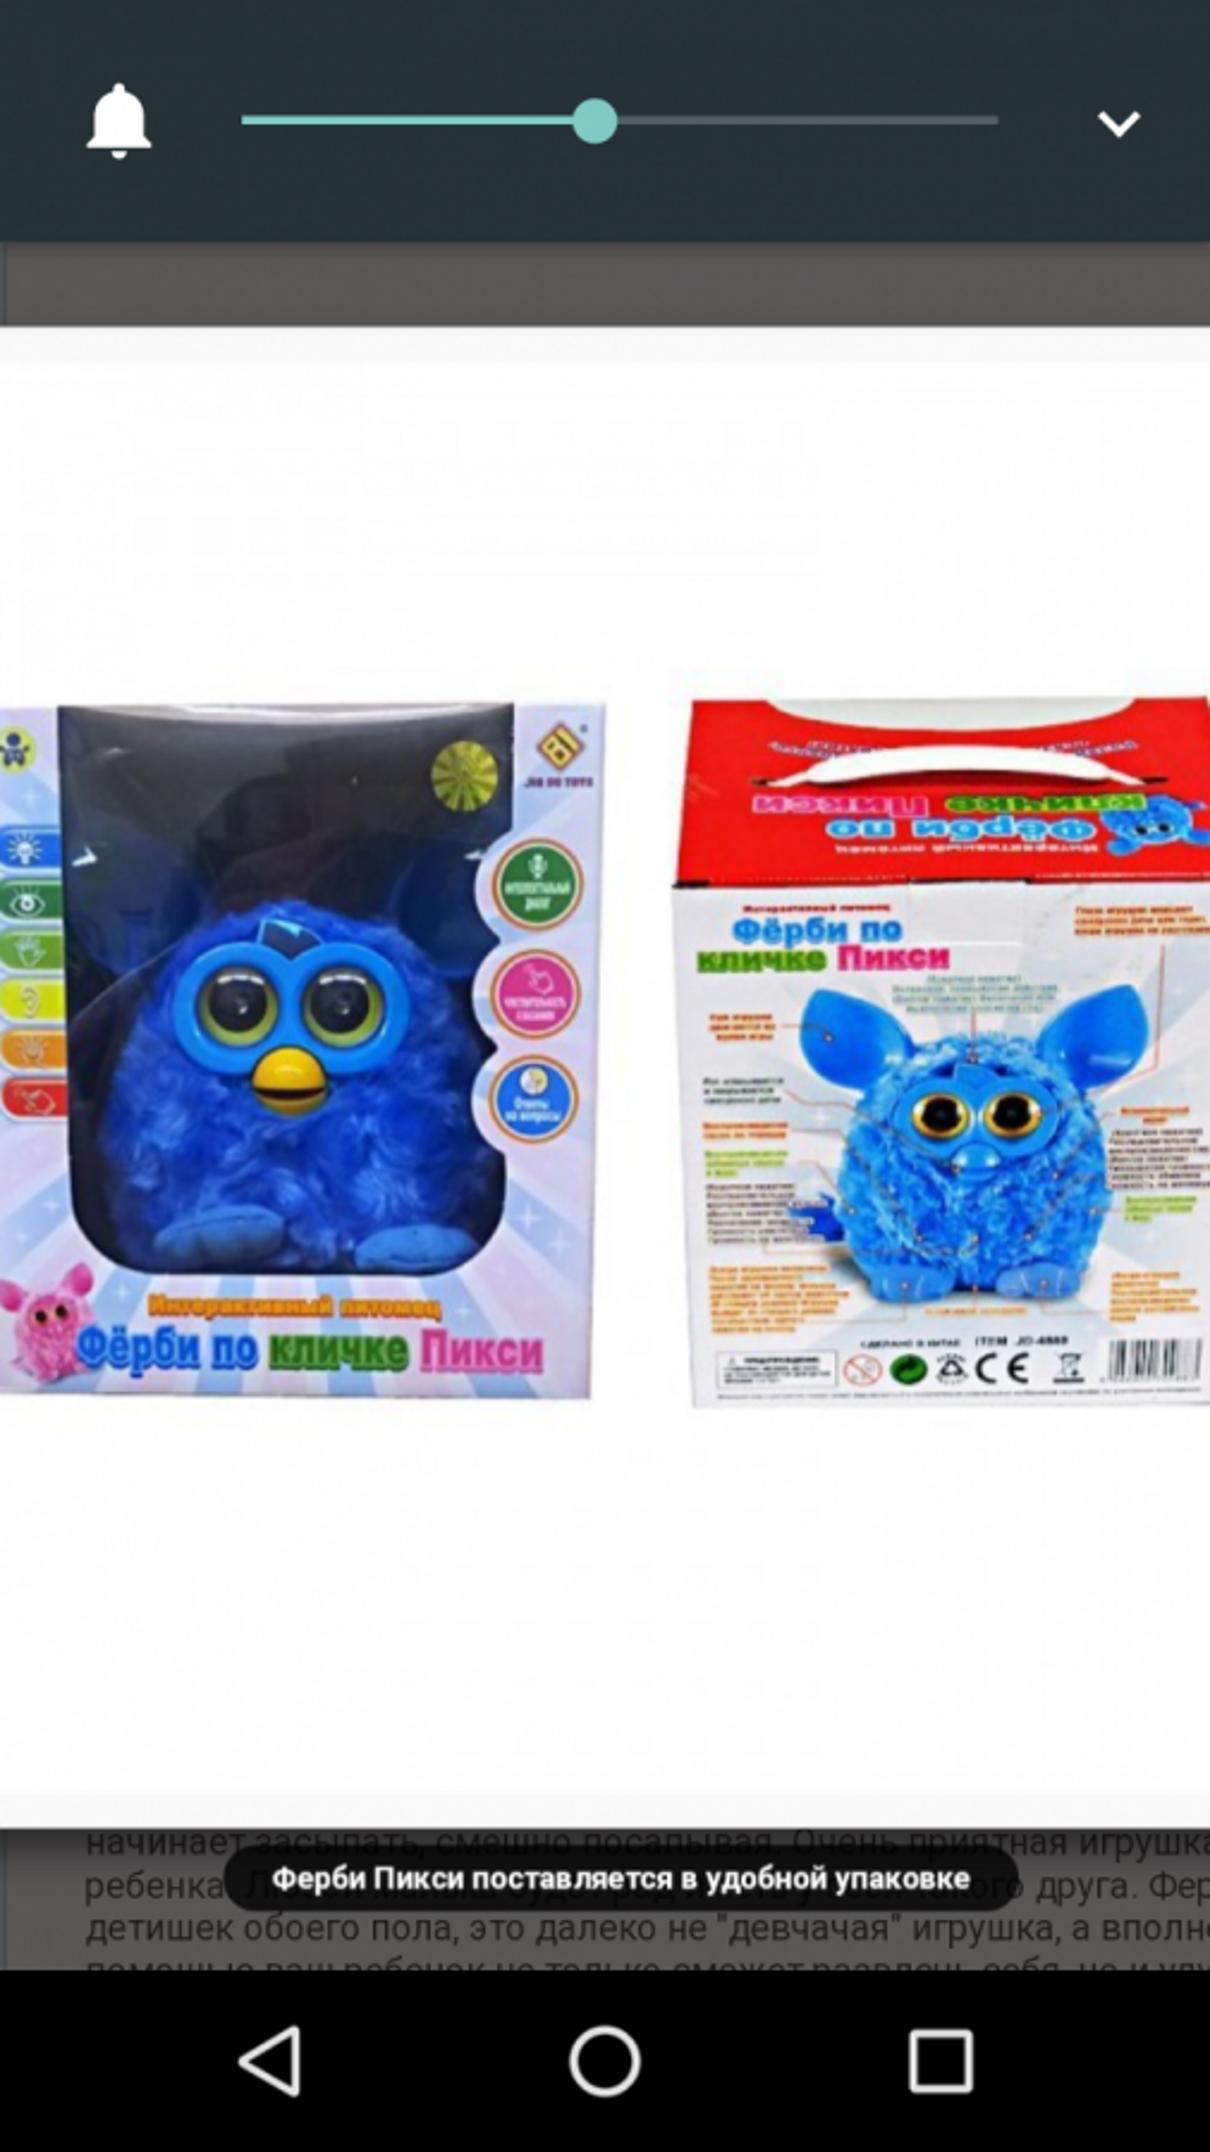 Жалоба-отзыв: Furby-toy.org - Мошеничество.  Фото №2